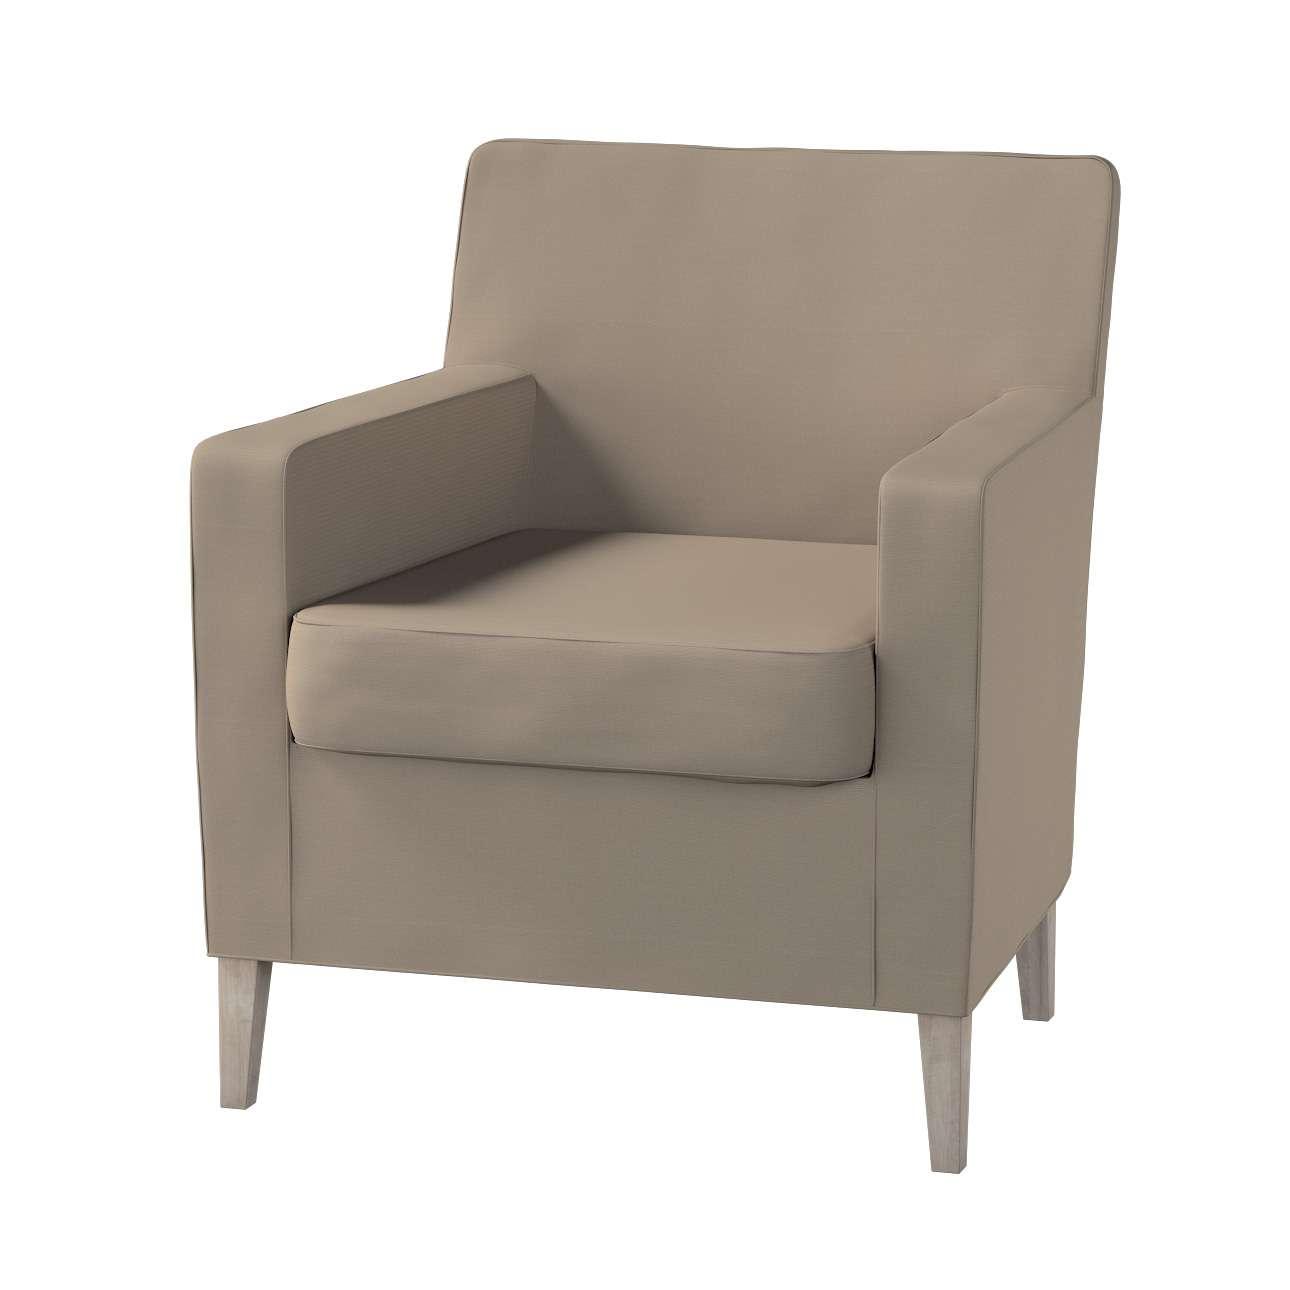 Karlstad sesselbezug hoch grau braun sesselhusse for Sessel schmal hoch